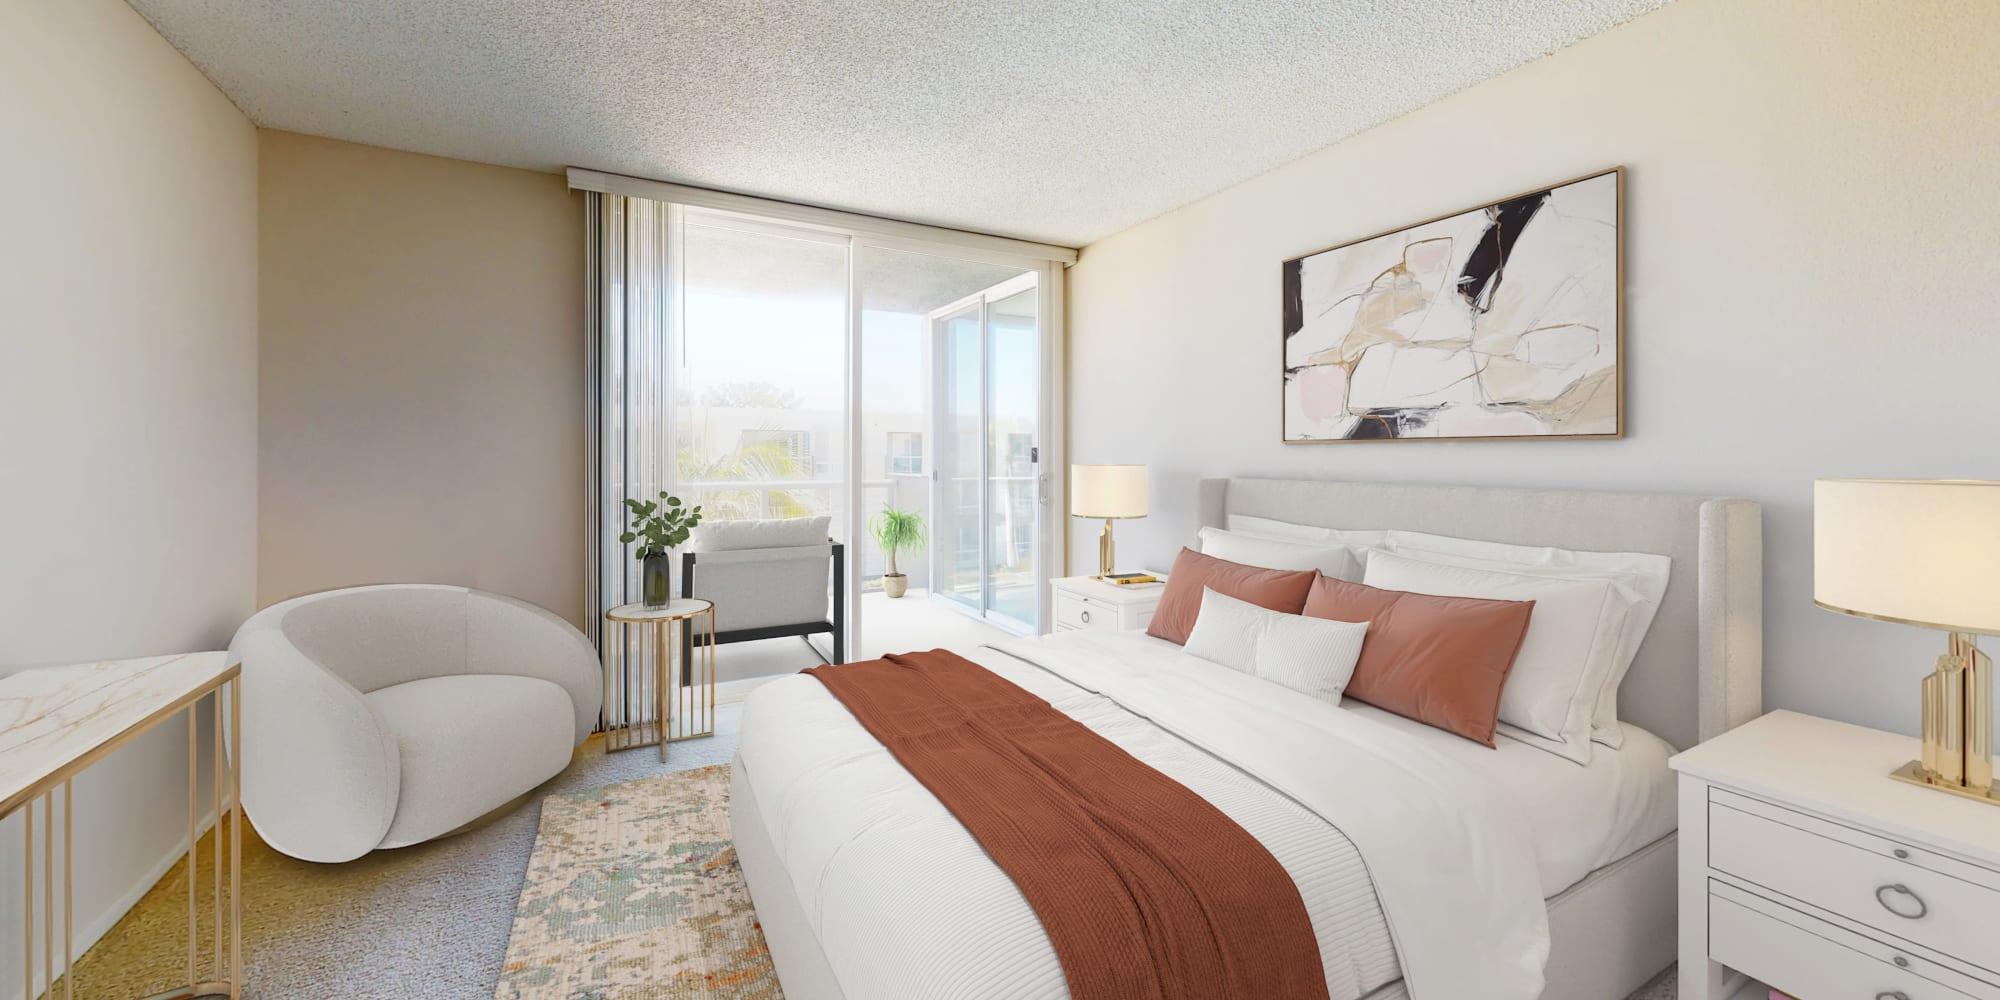 Spacious bedroom with a view of the marina at Waters Edge at Marina Harbor in Marina del Rey, California